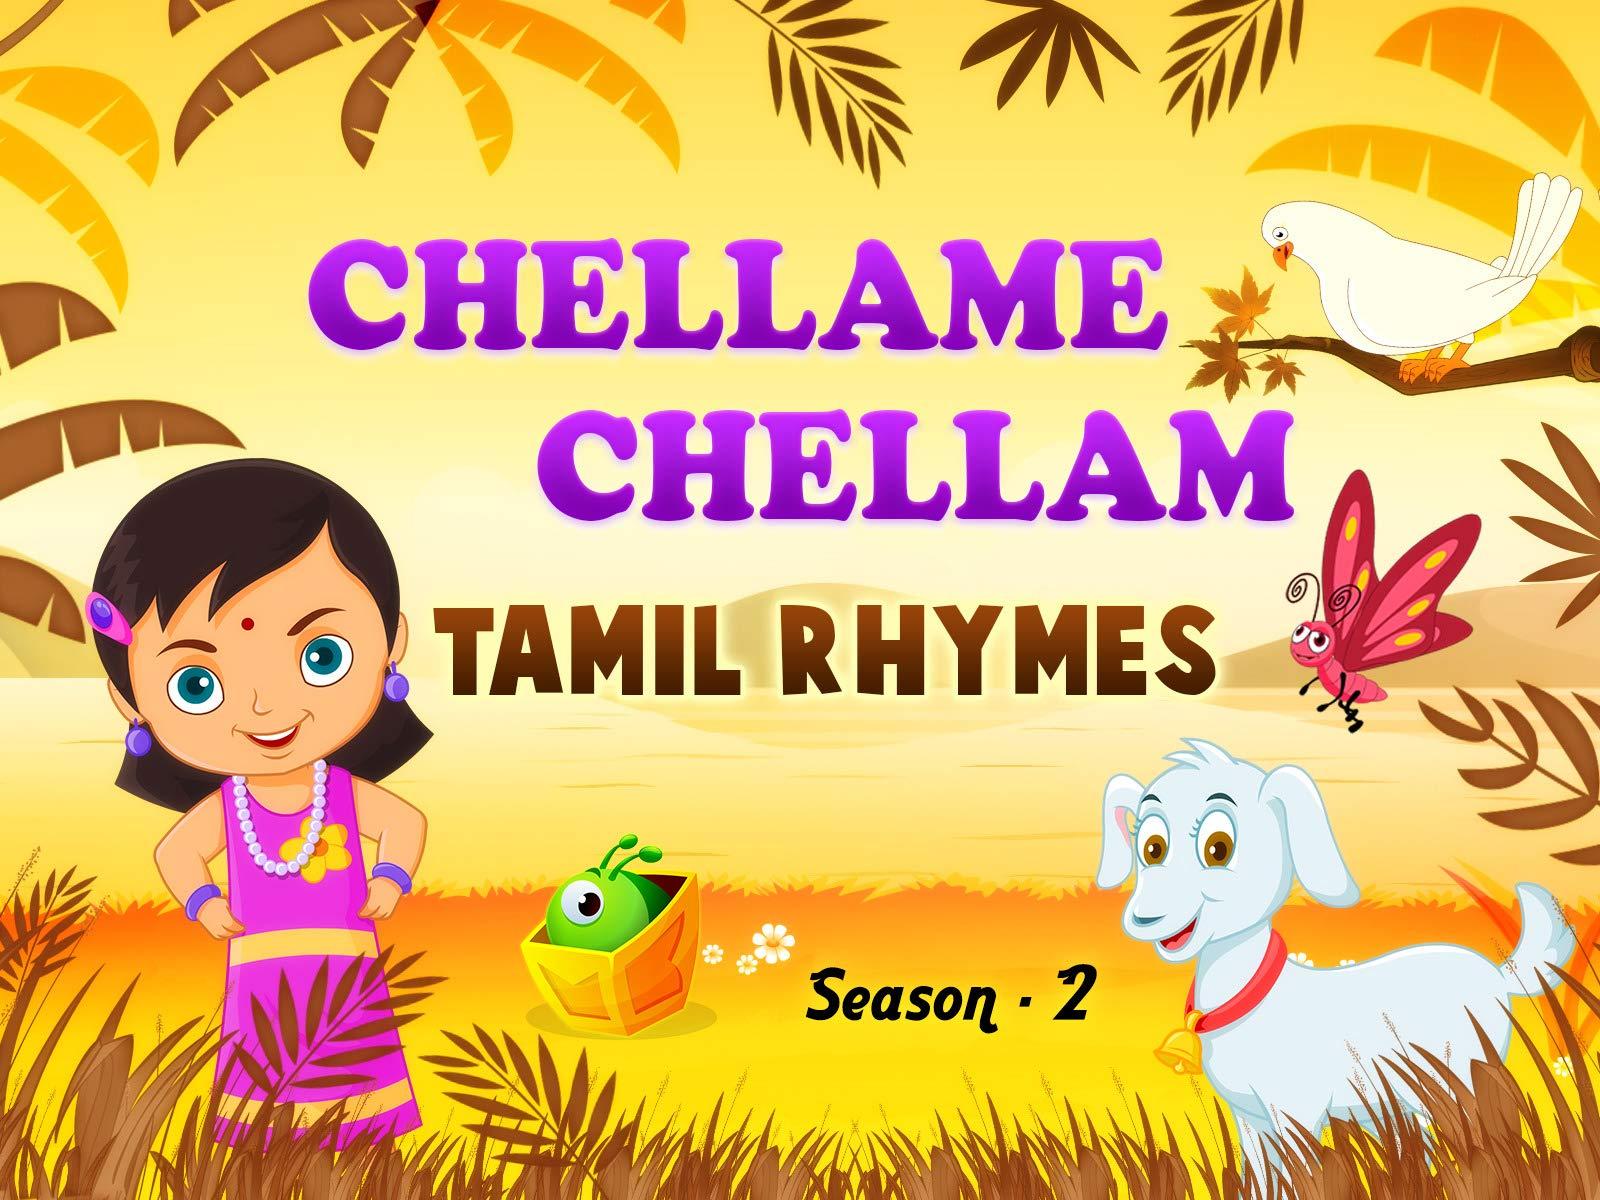 Chellame Chellam - Season 2